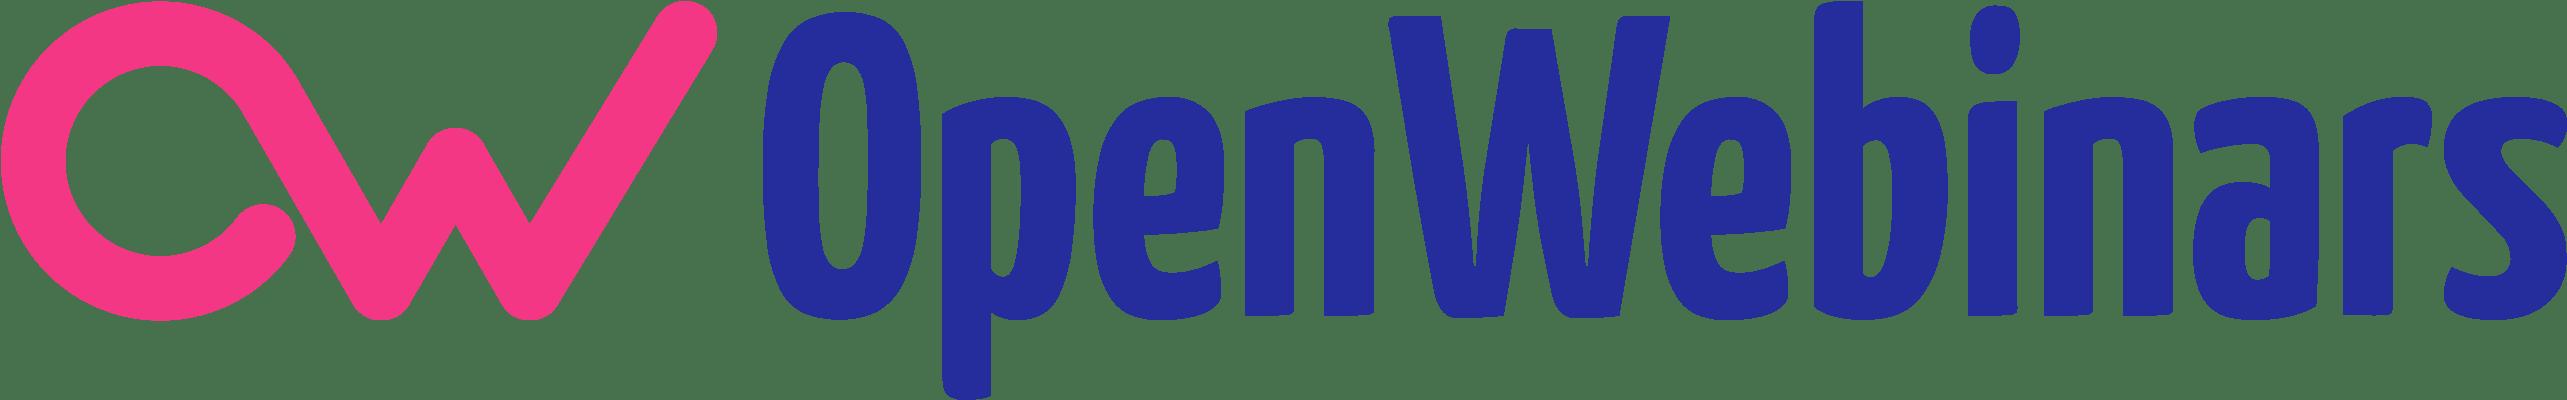 openwebinars logo